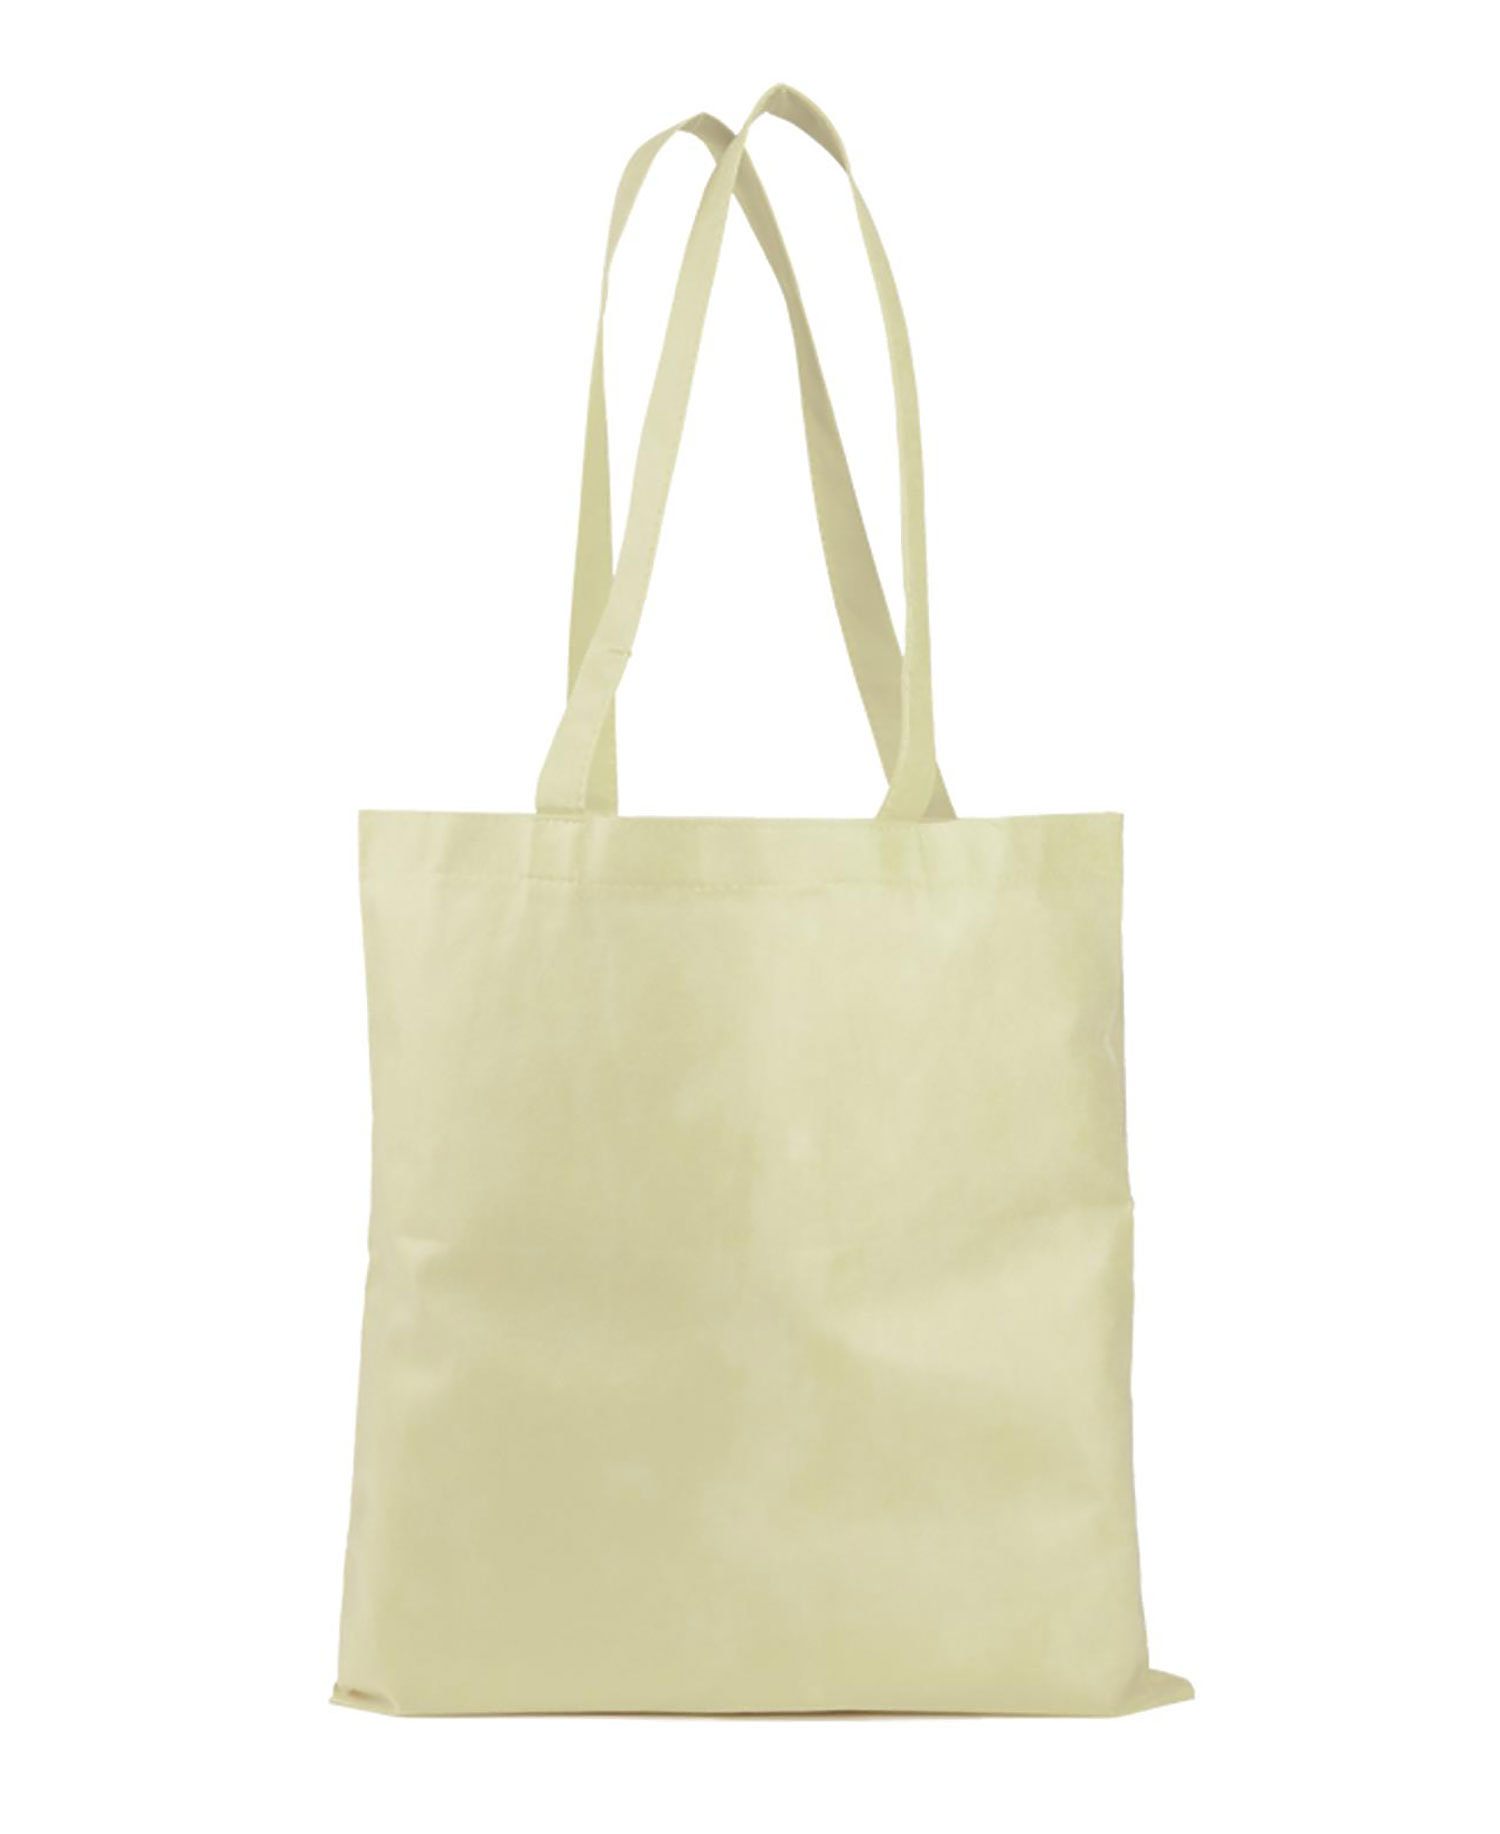 Q-Tees Q126300 - Non Woven Tote Bag